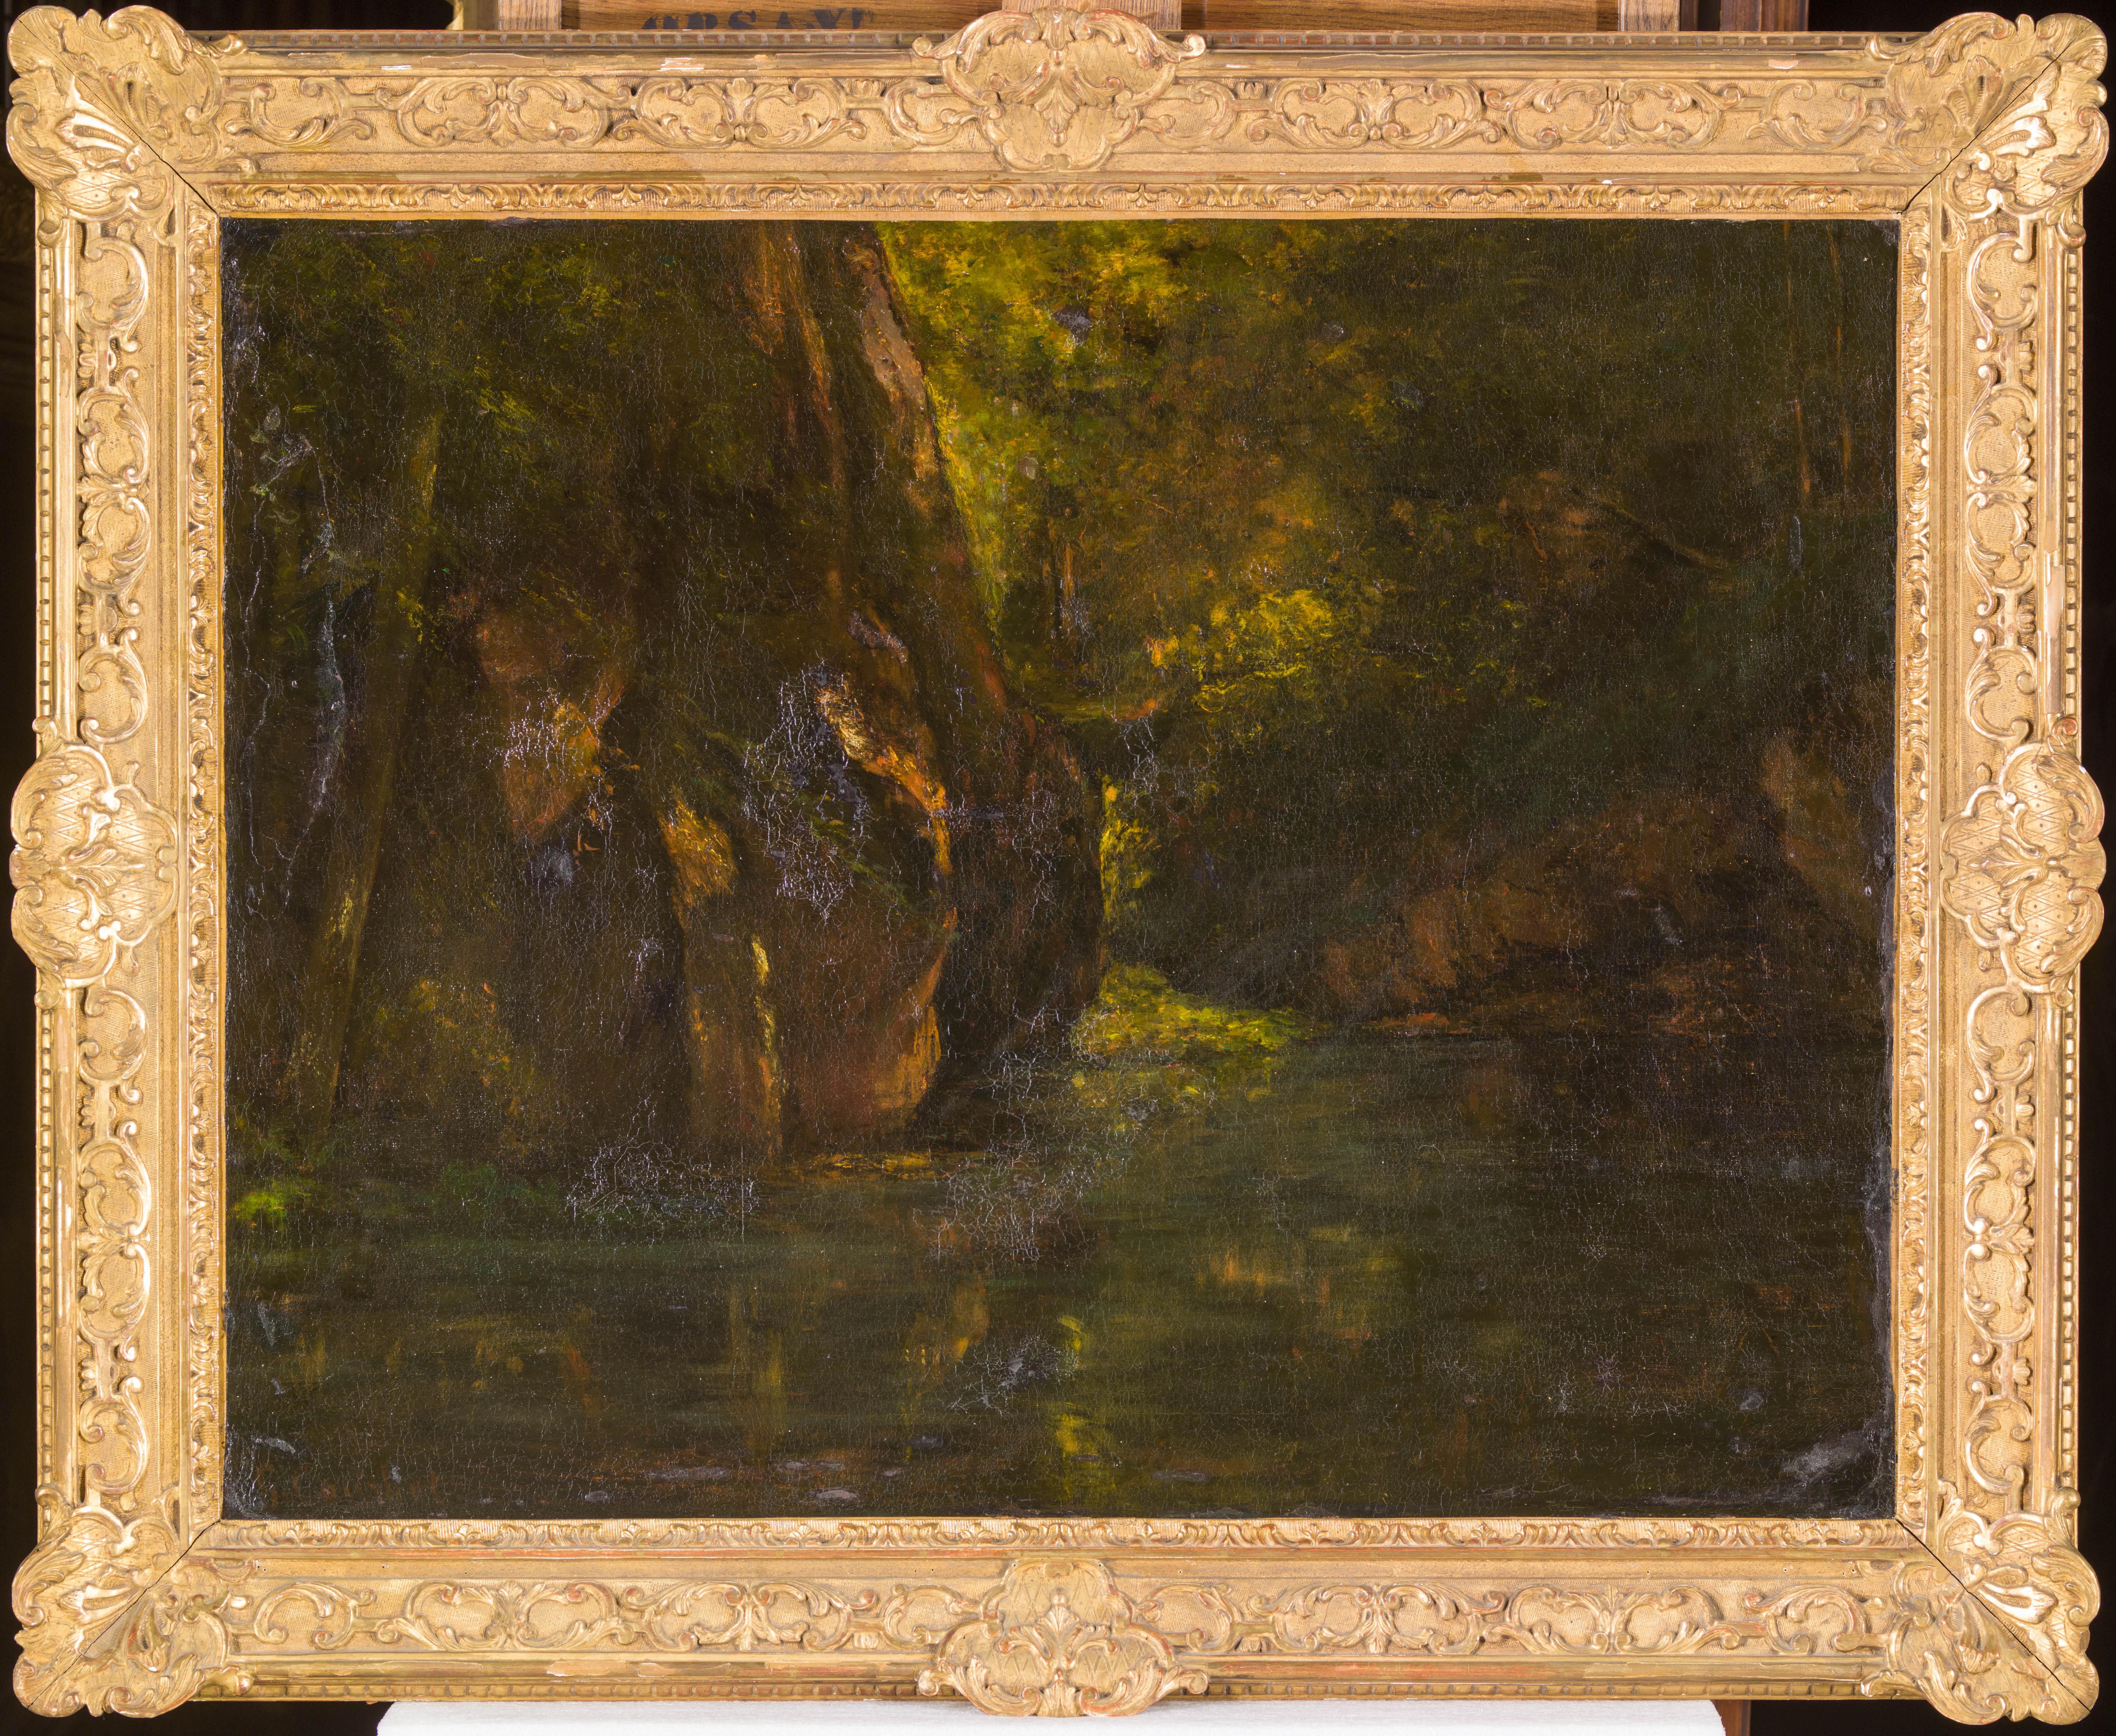 mnr/MNR00174/MNR174-copyright_Musee_d_Orsay_distribution_RMN-Grand_Palais_Patrice_Schmidt.jpg